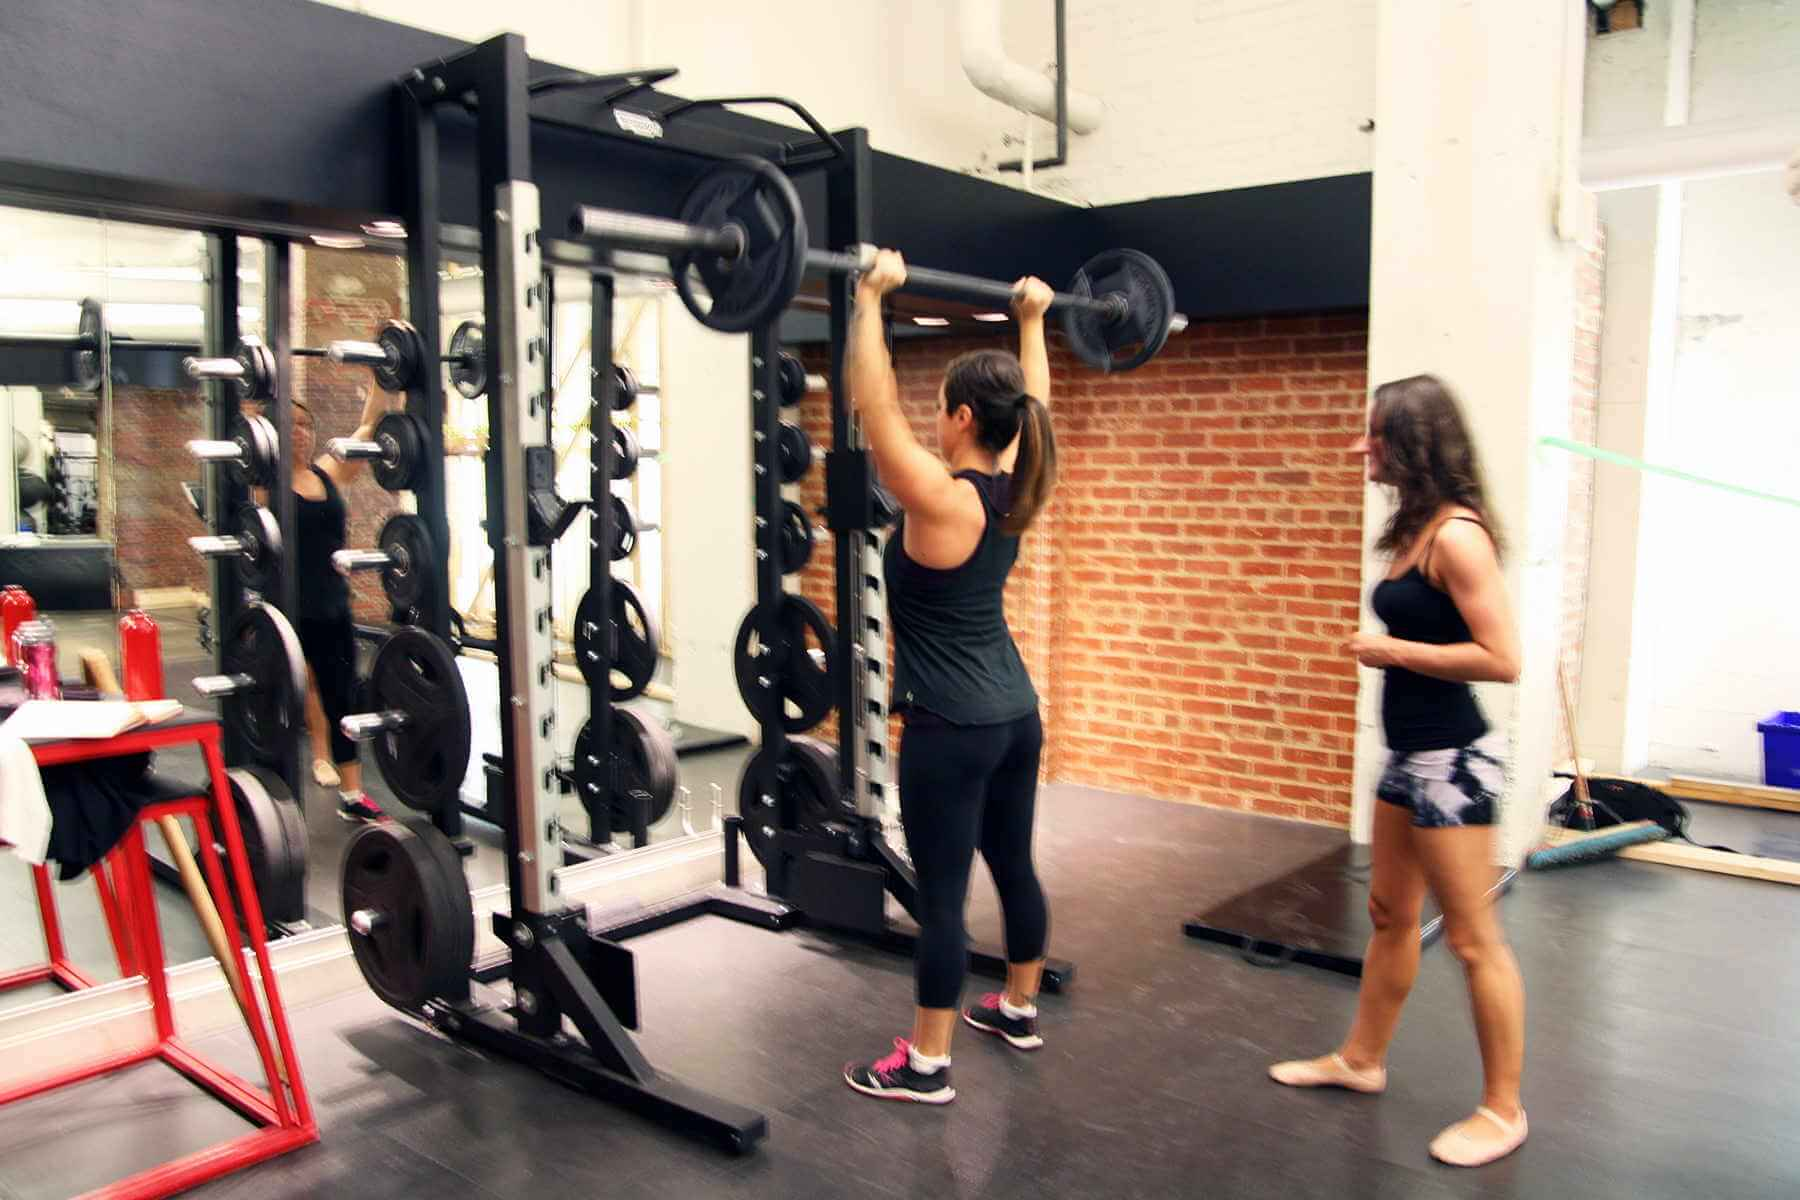 alicia-putinkski-personal-training-vancouver